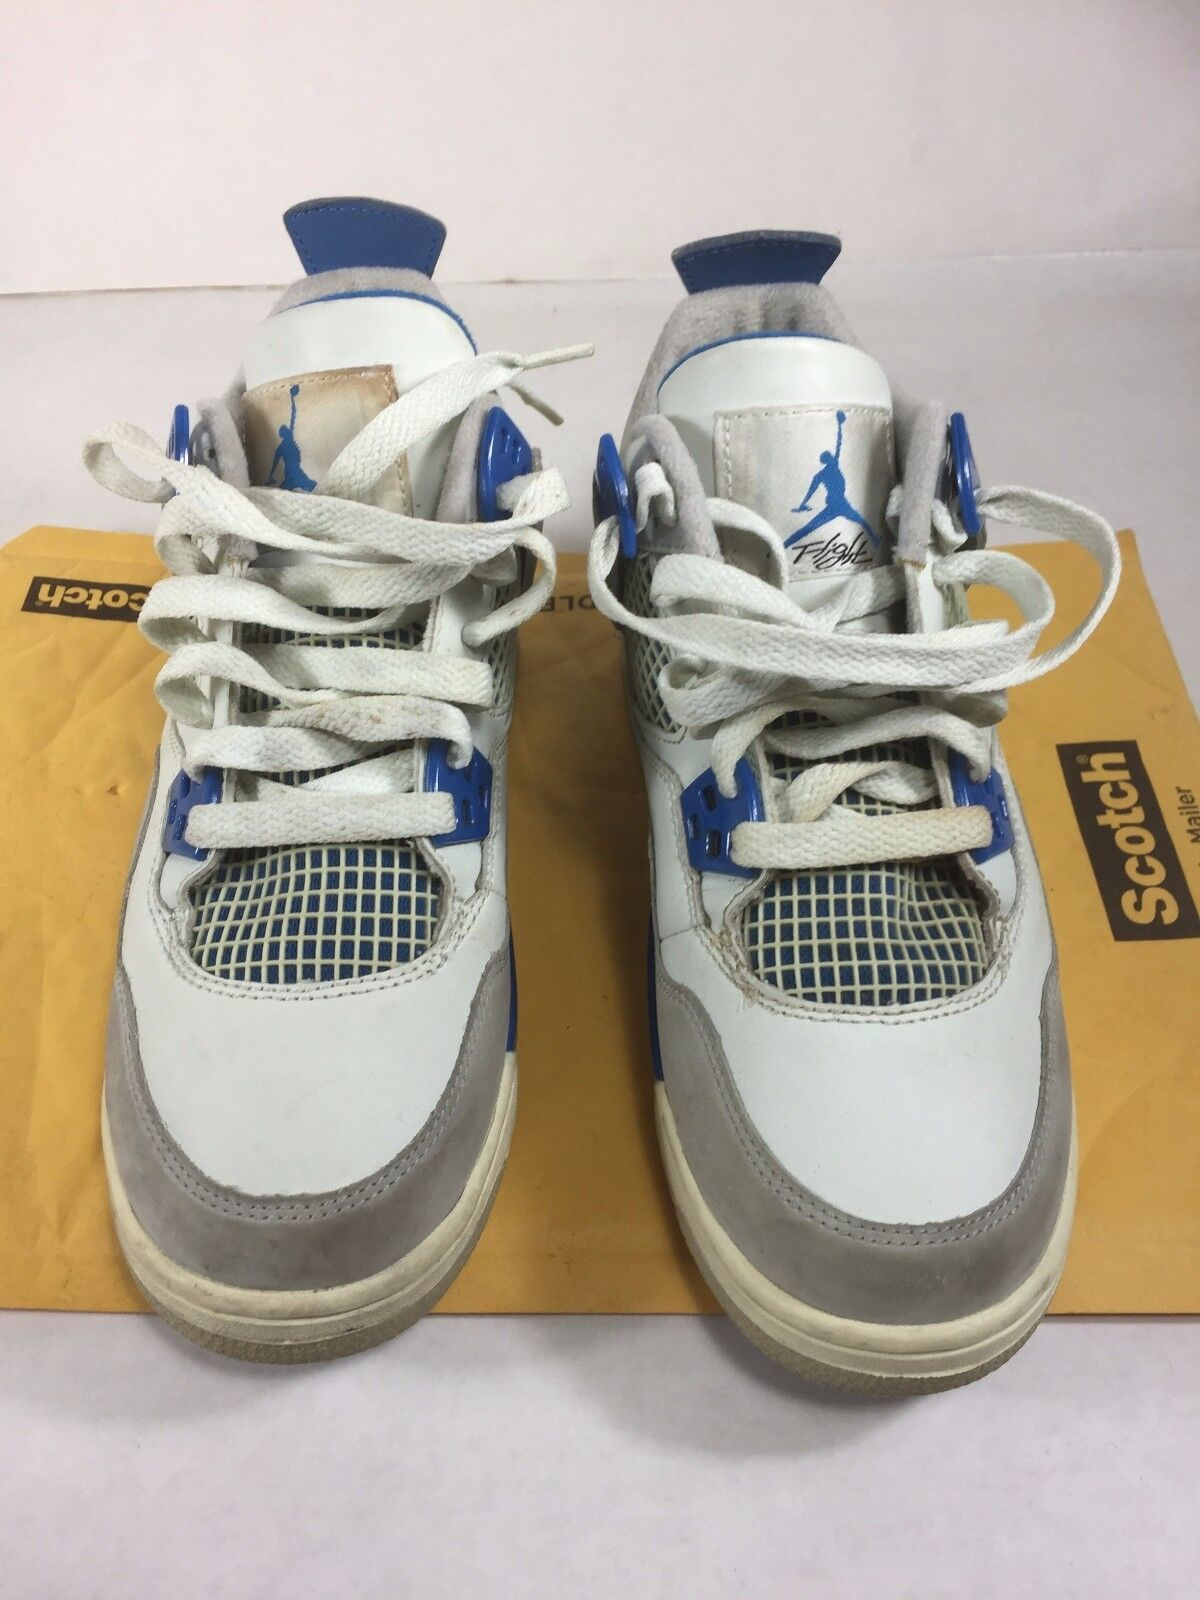 Air Jordan Retro IV 4 Military Blue White Neutral Grey Comfortable Seasonal clearance sale